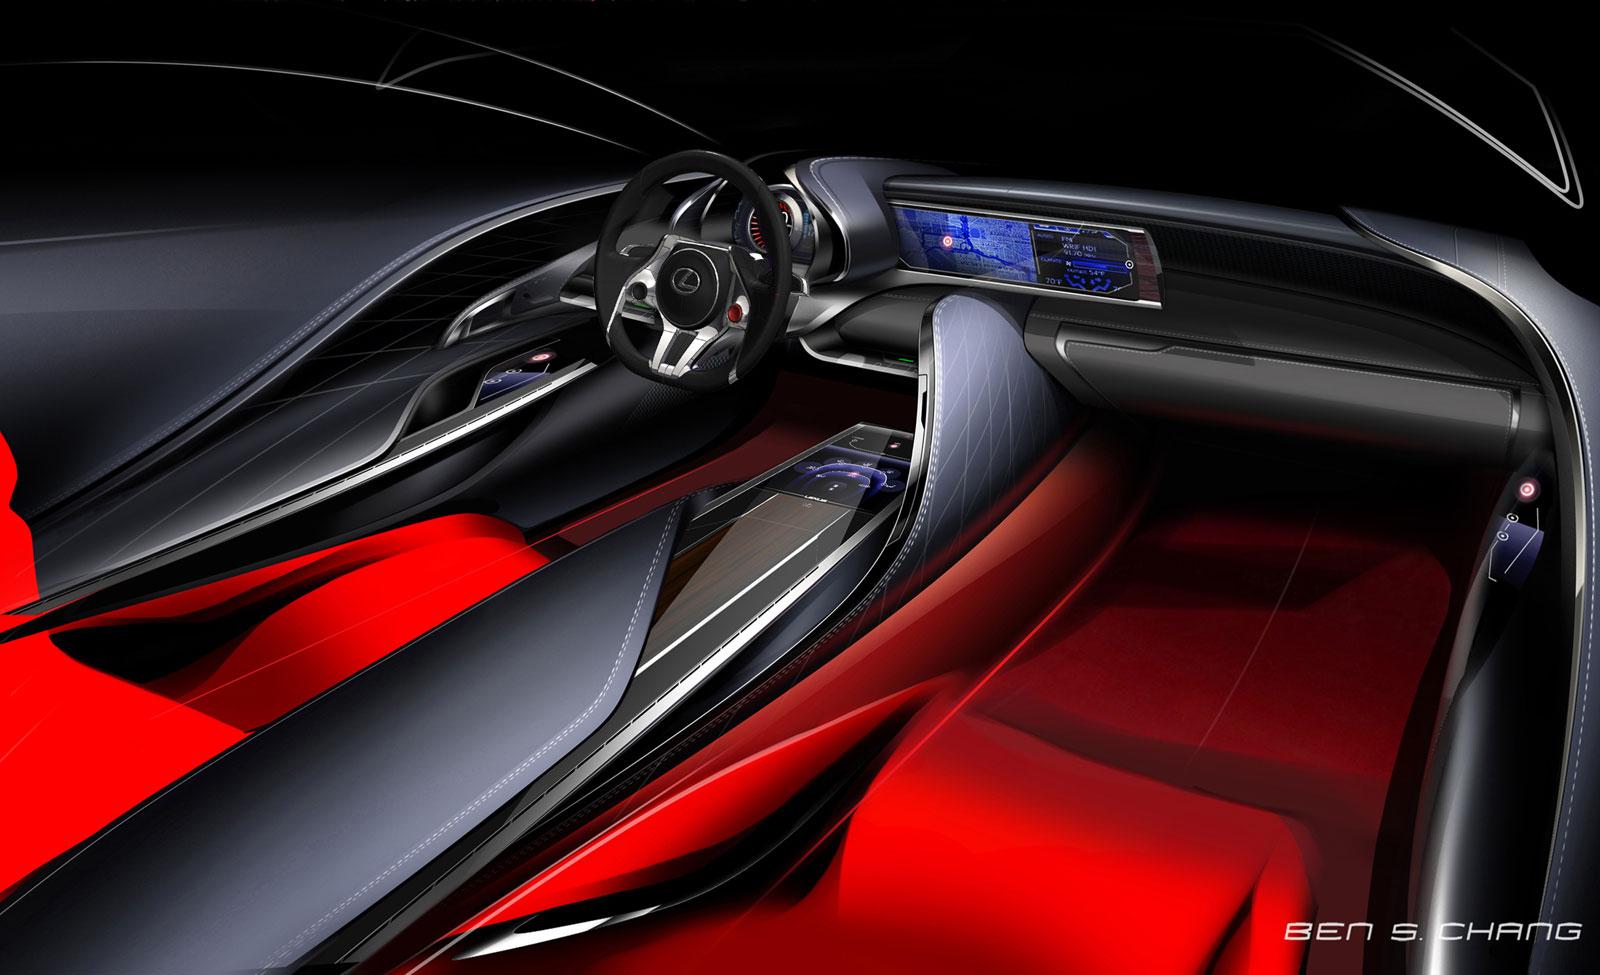 http://www.carbodydesign.com/media/2012/01/Lexus-LF-LC-Concept-Interior-Rendering-01.jpg